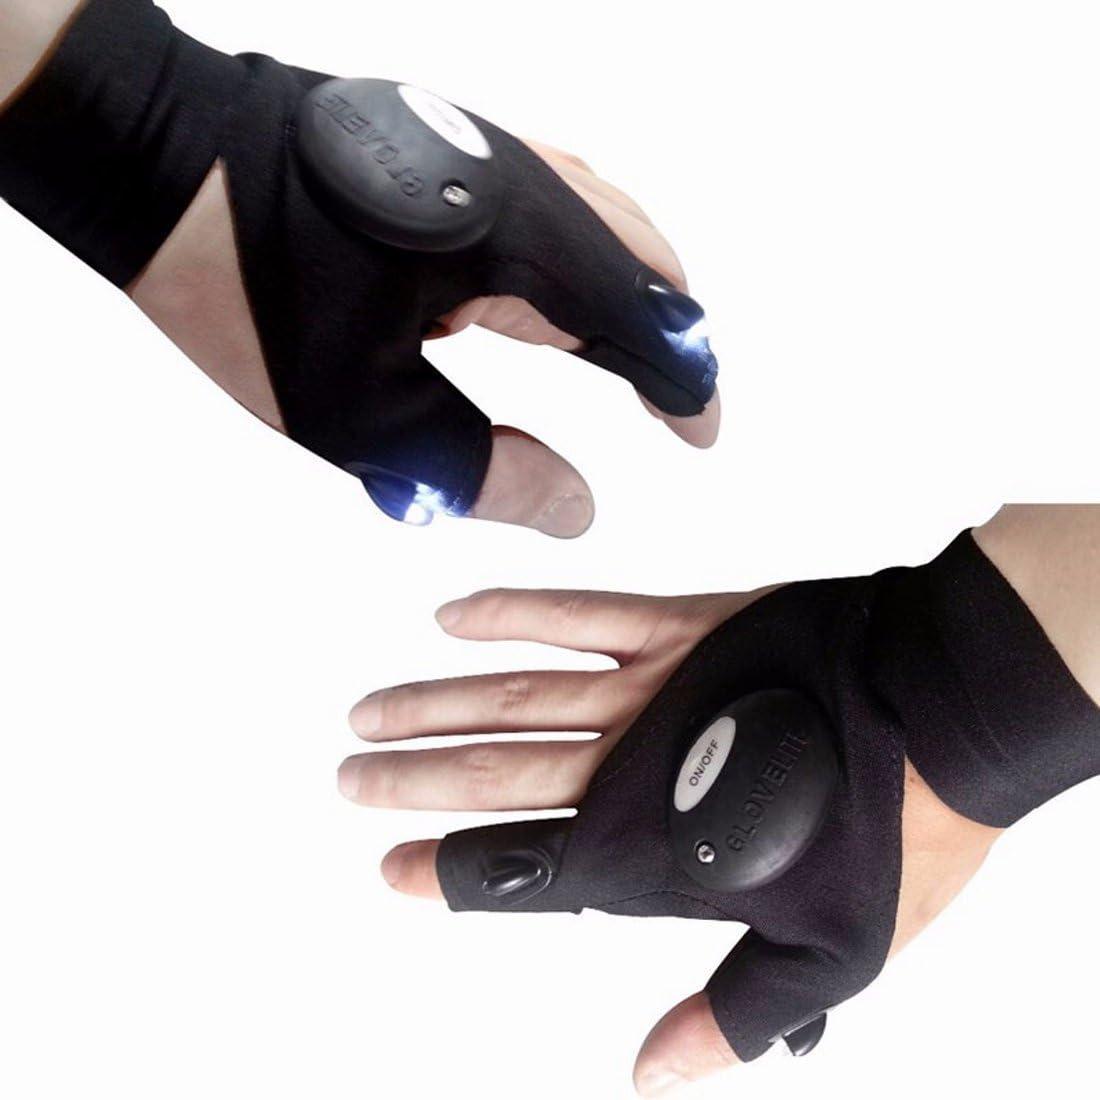 Mitaines-Gants-LED-lampe de Poche-Gants-LED-Light-pêche-Gloves-gants-mitaine 1